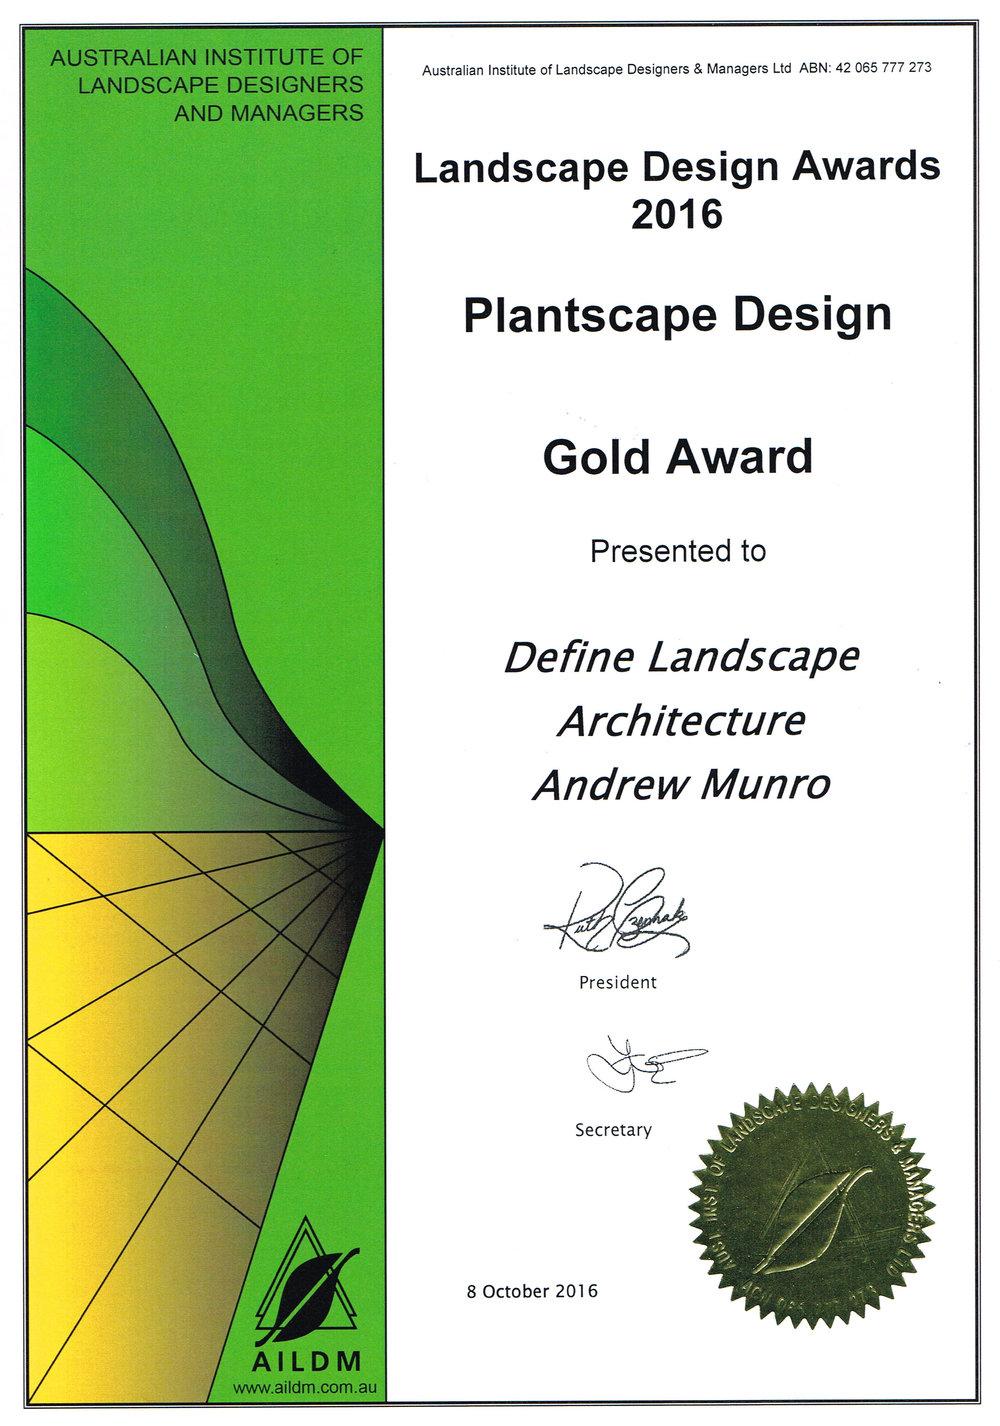 2016 AILDM Certificate Gold Award Plantscape.jpg